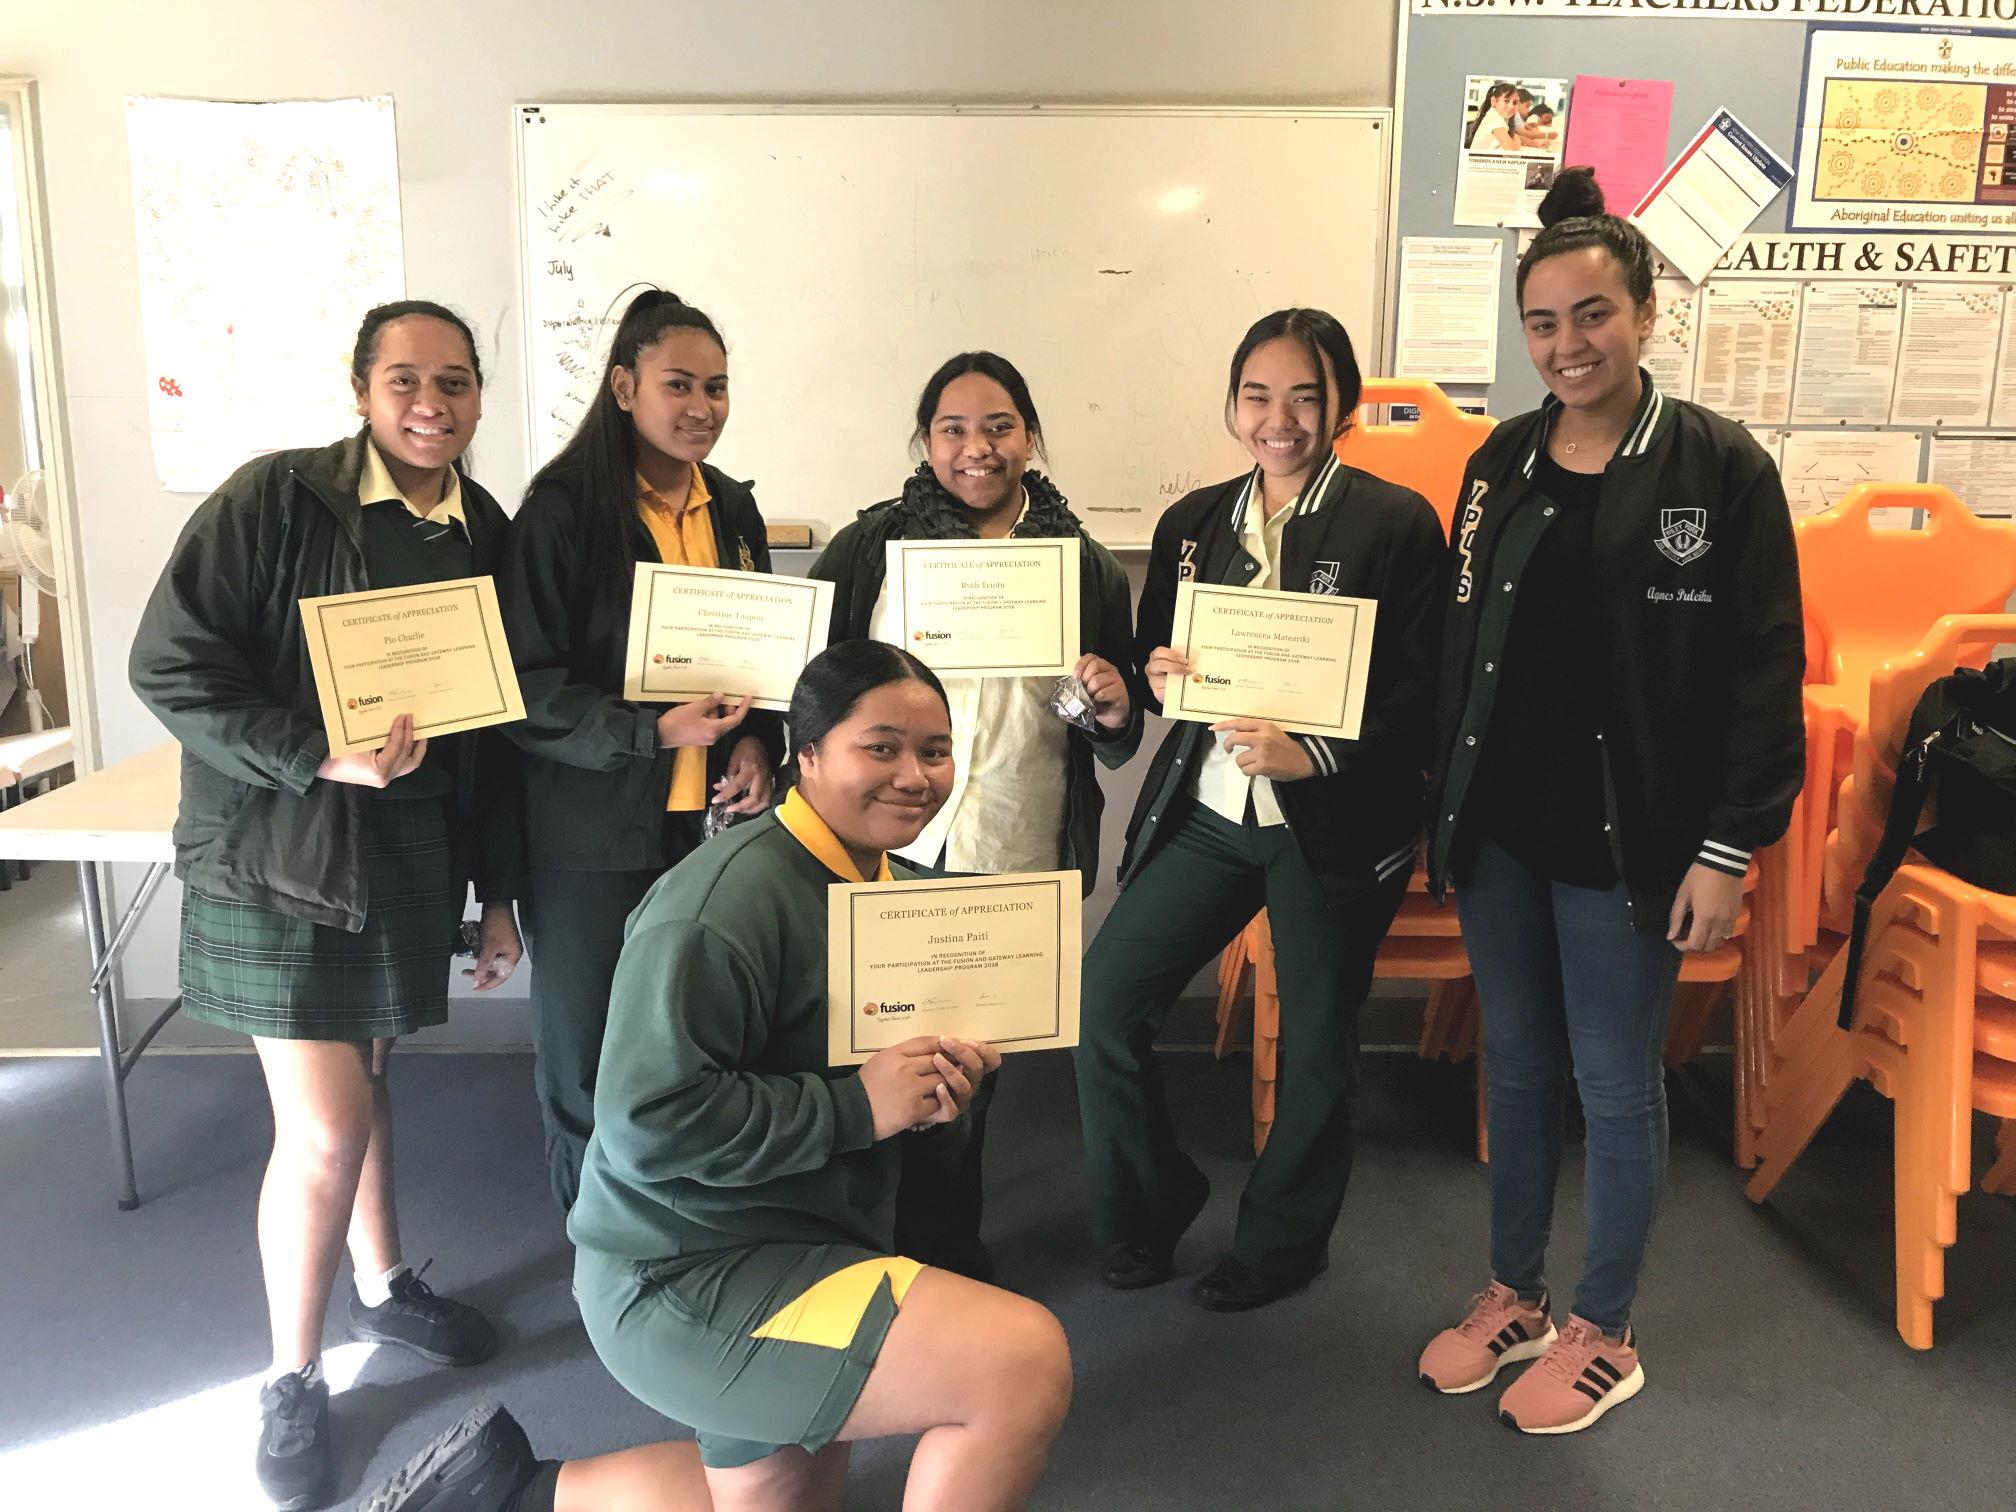 Learning Leadership Workshop, Wiley Park Girls High School